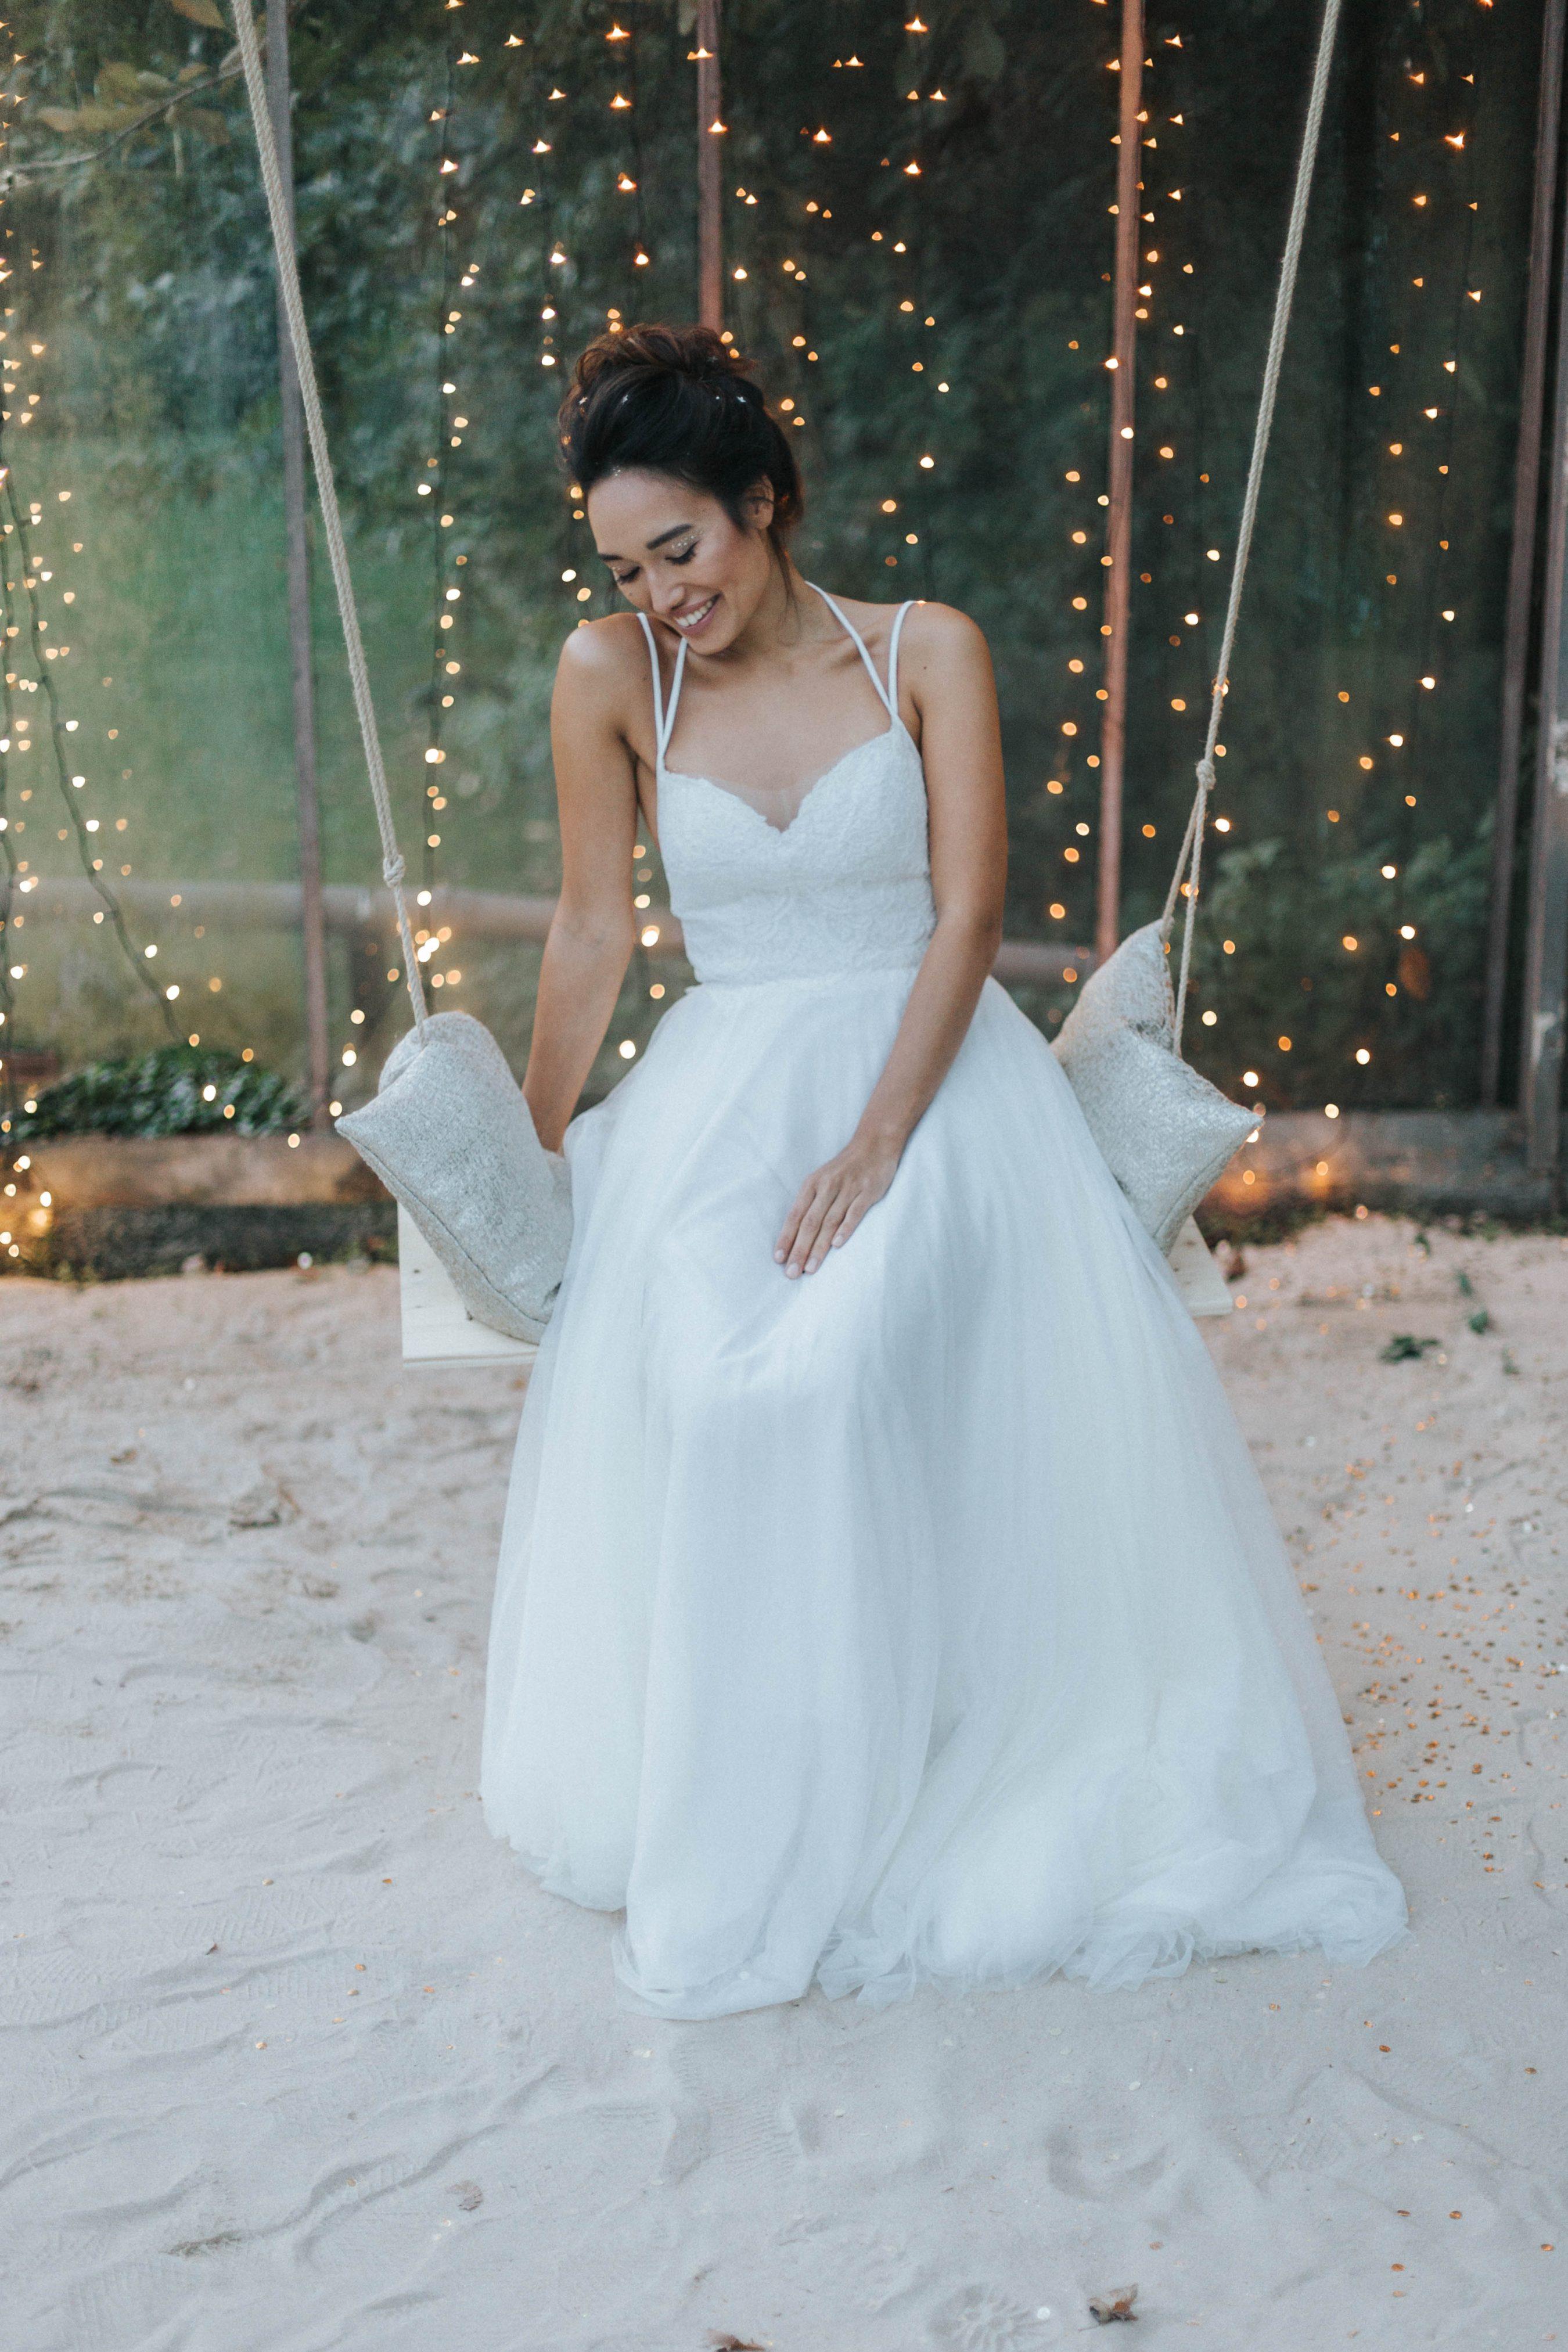 Brautfrisur hochgesteckt, Brautfrisur undone, Brautfrisur lockerer Dutt